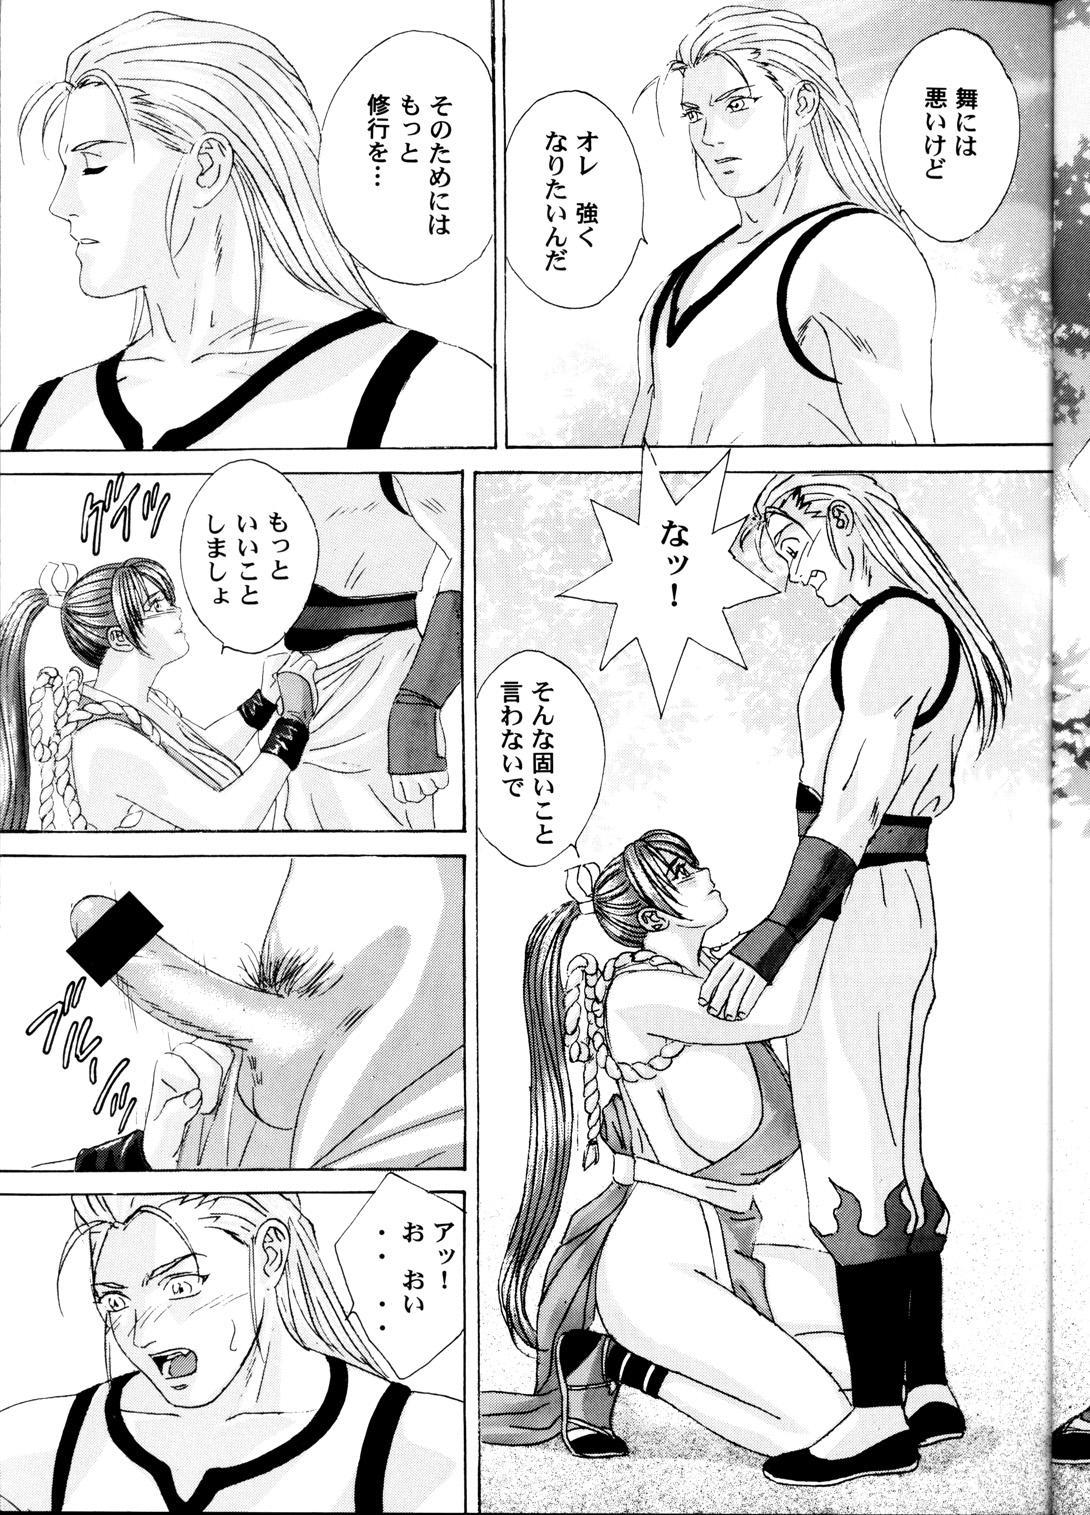 (C60) [D-LOVERS (Nishimaki Tohru)] Mai -Innyuuden- Daiichigou (King of Fighters) 5